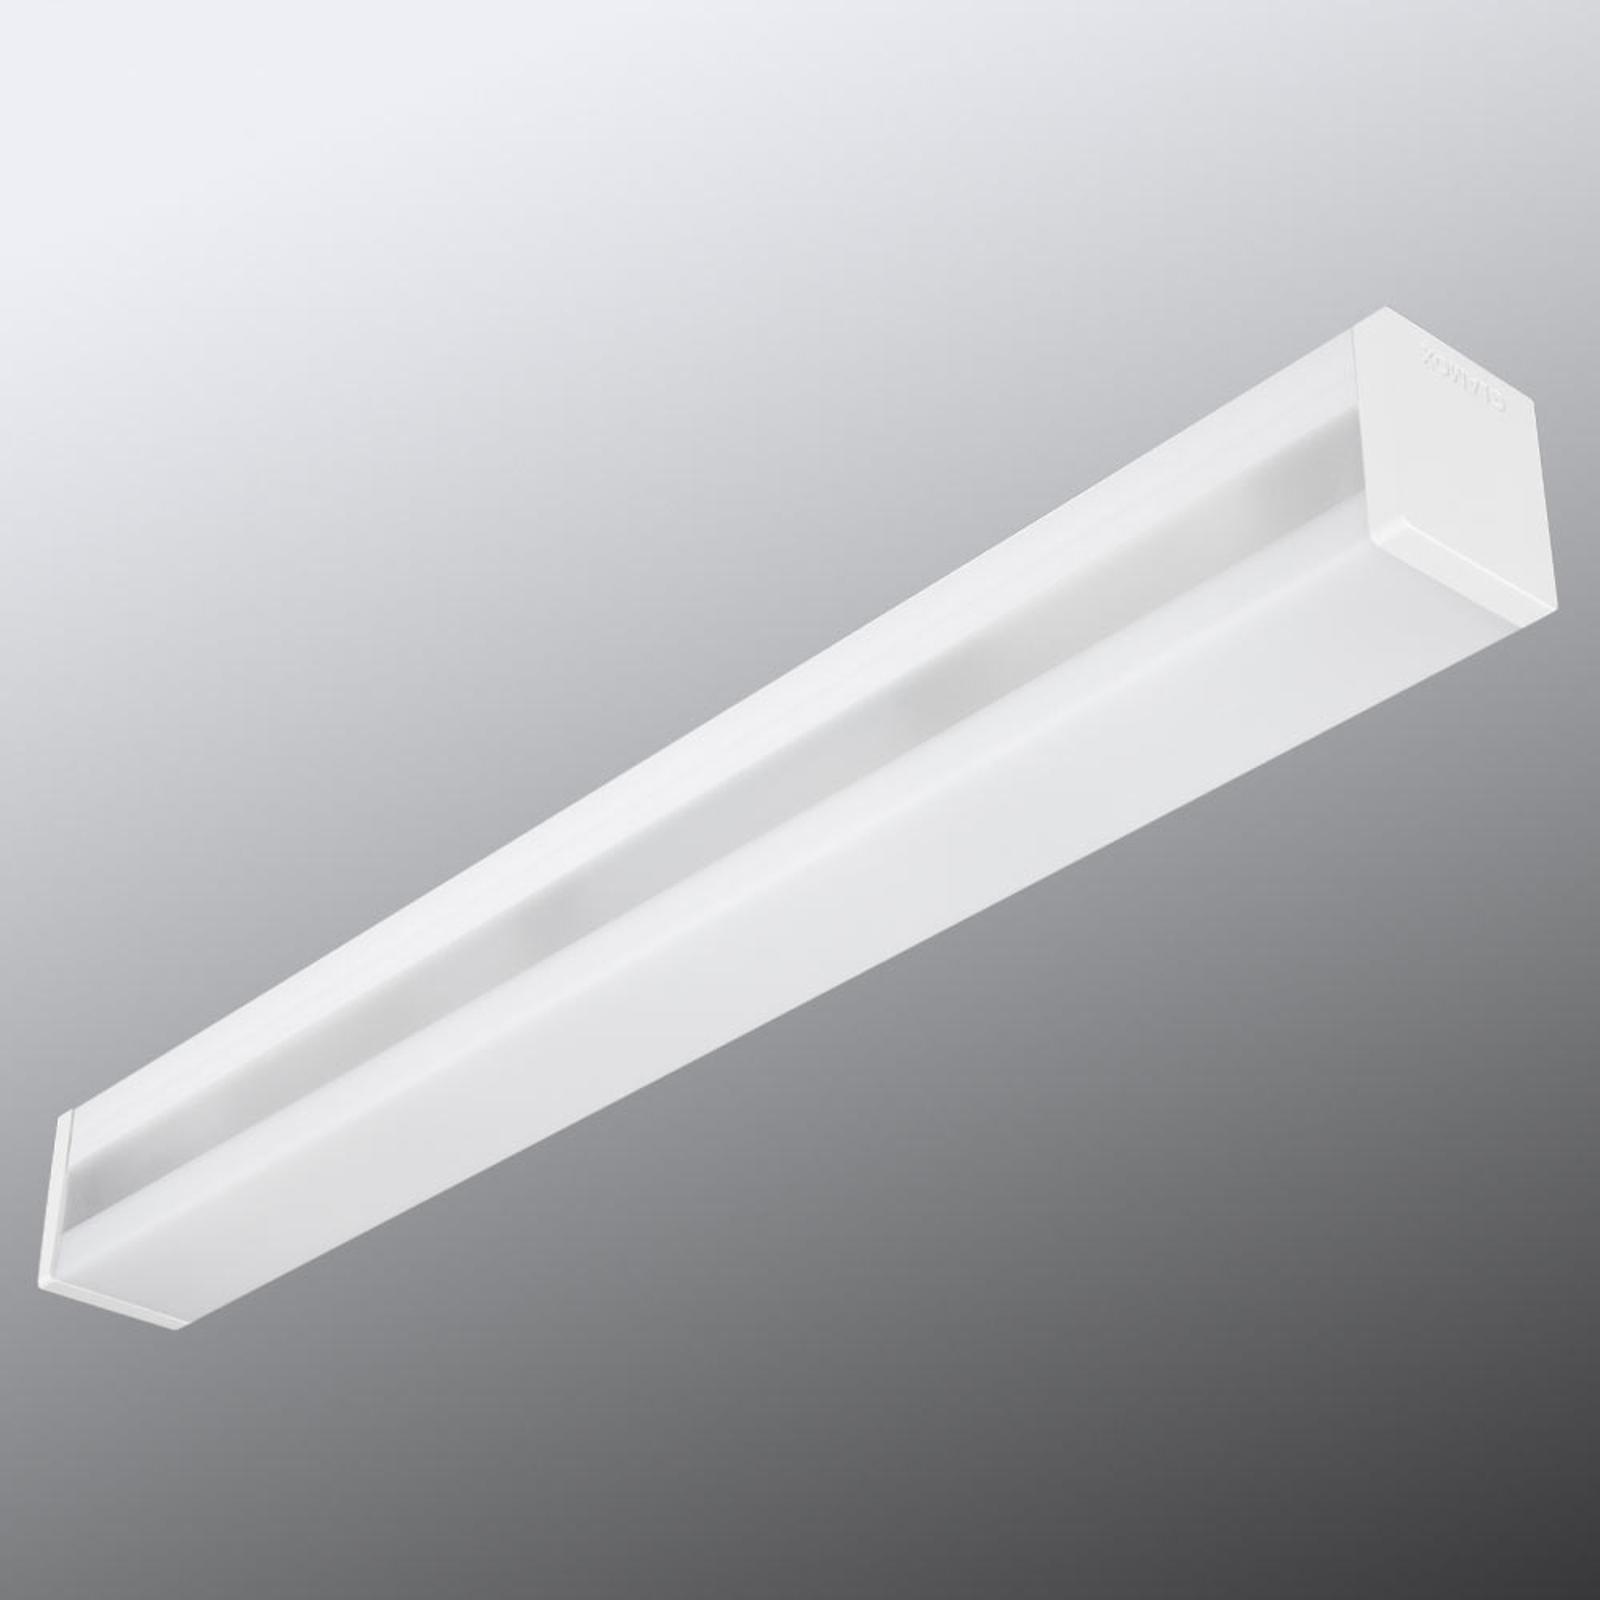 LED-speillampe A40-W600 LED 1400HF 830 60 cm